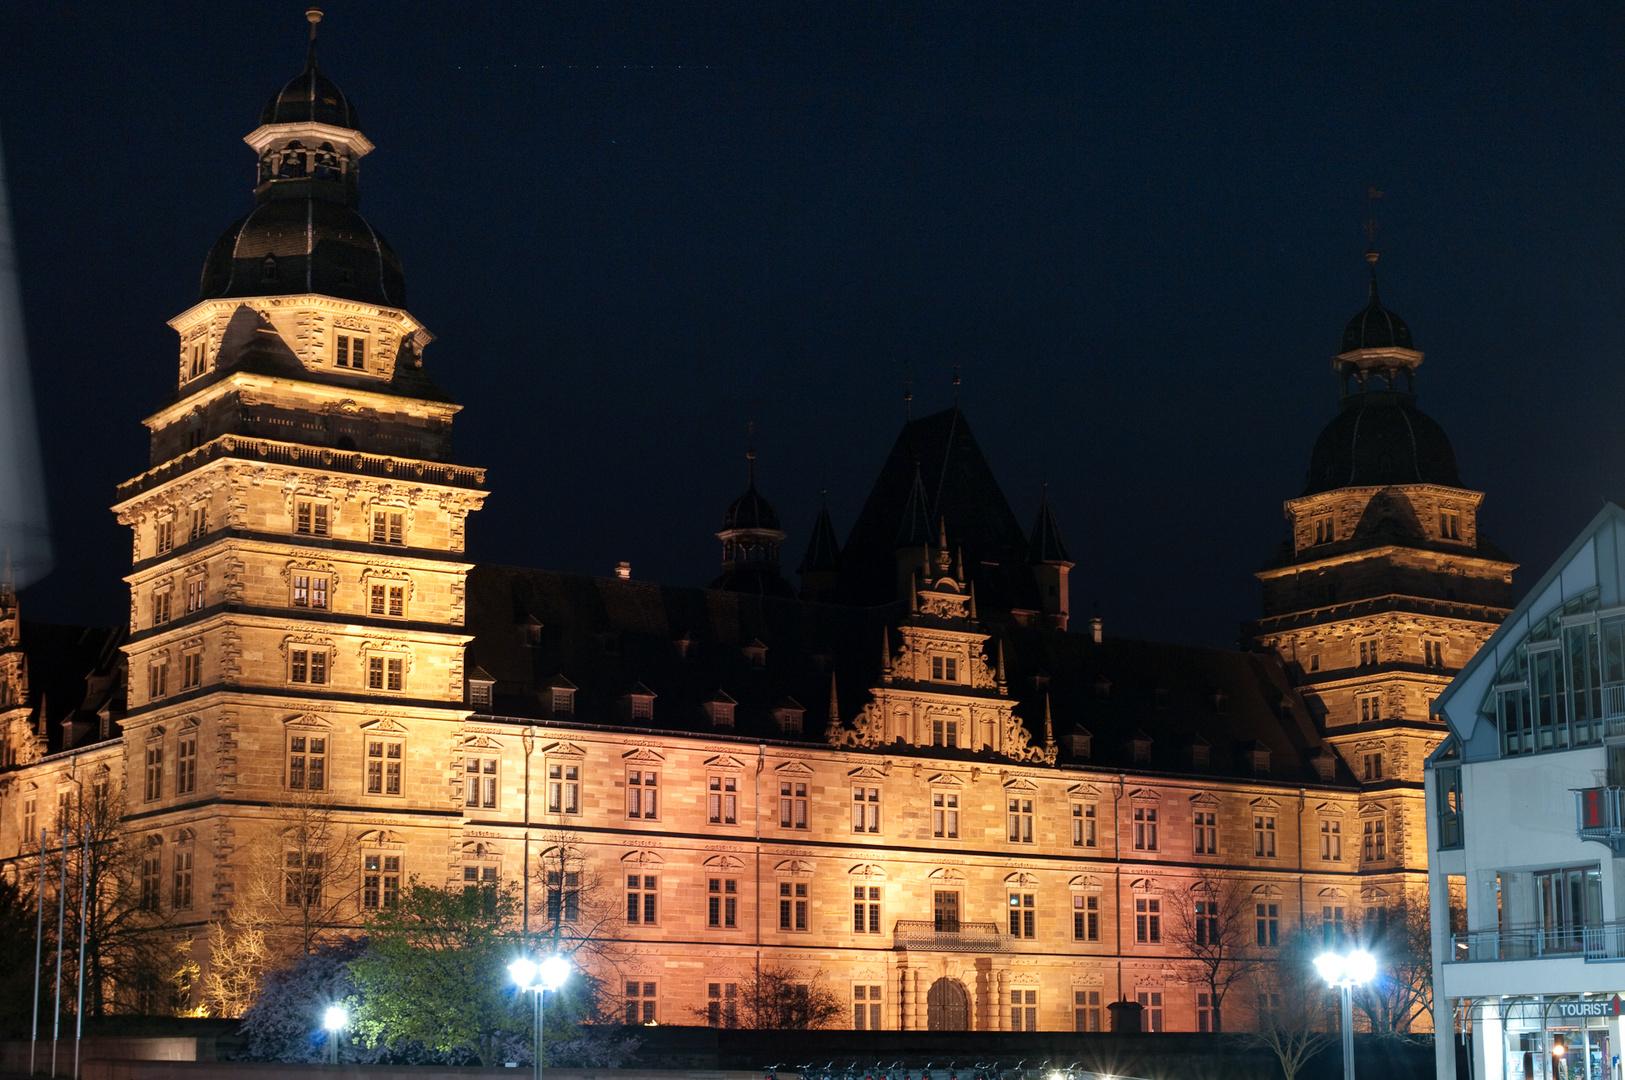 Schloss Johannisburg at night